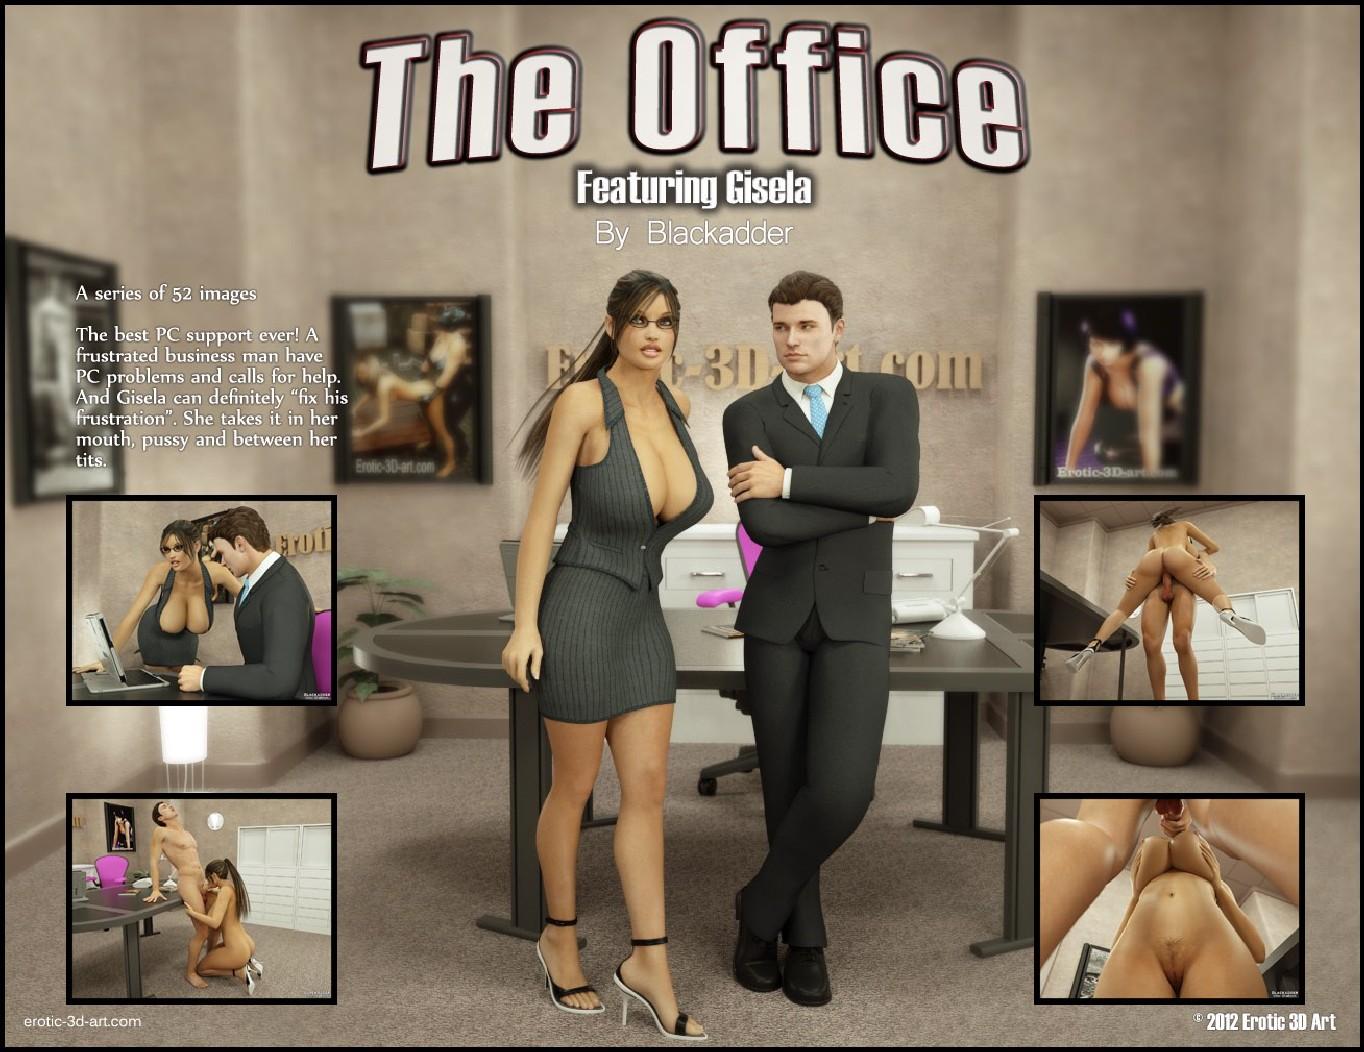 Blackadder- The Office image 1